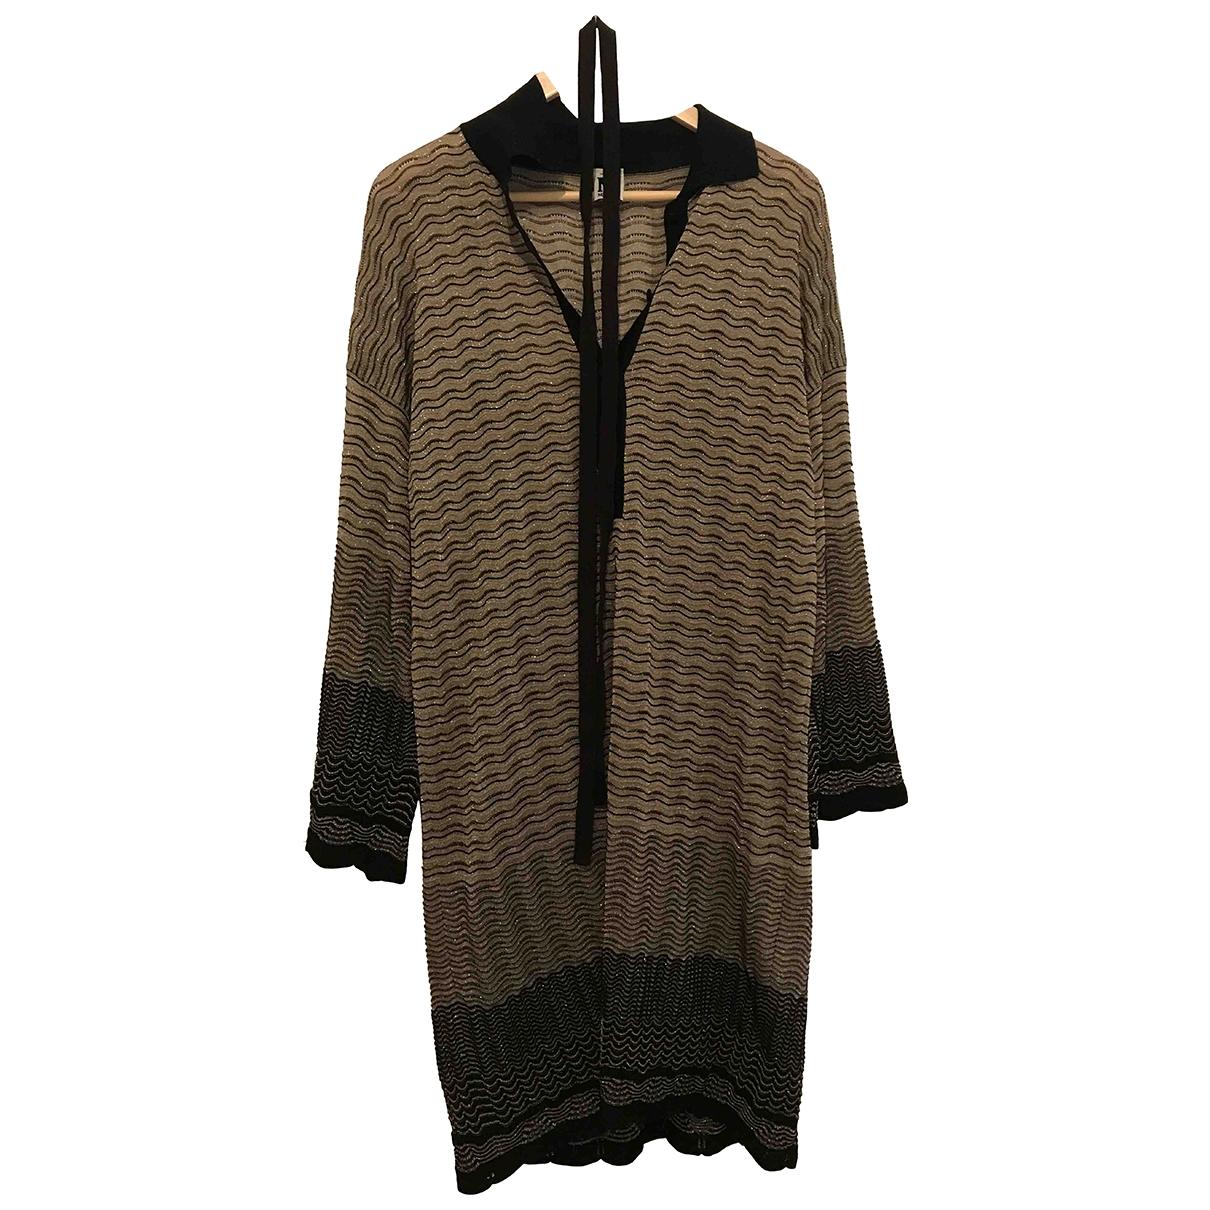 M Missoni \N Gold Cotton dress for Women 44 IT